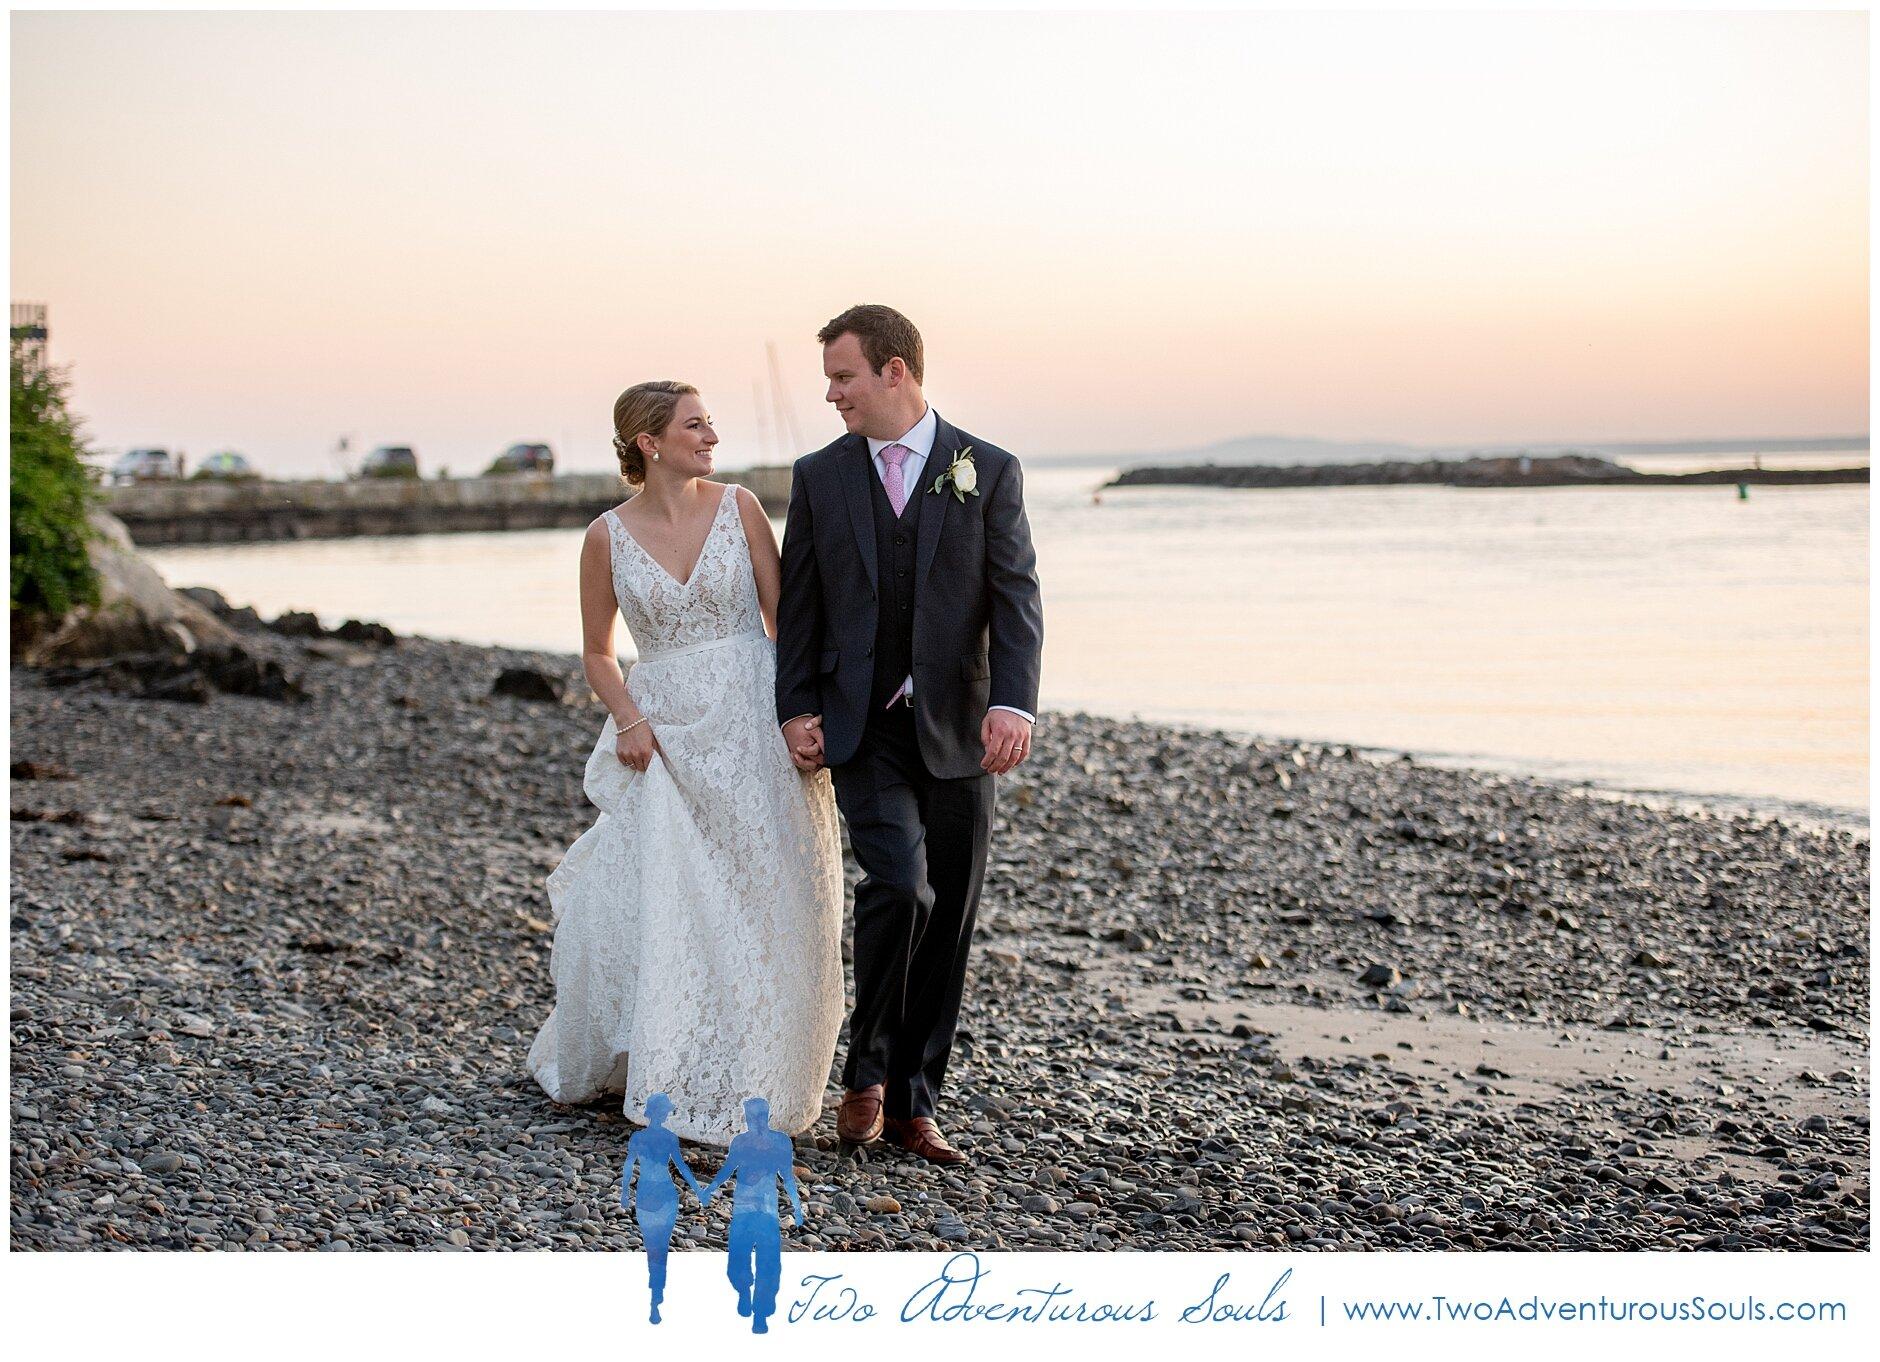 Breakwater Inn and Spa Wedding Photographers, Kennebunkport Wedding Photographers, Two Adventurous Souls- 092119_0053.jpg